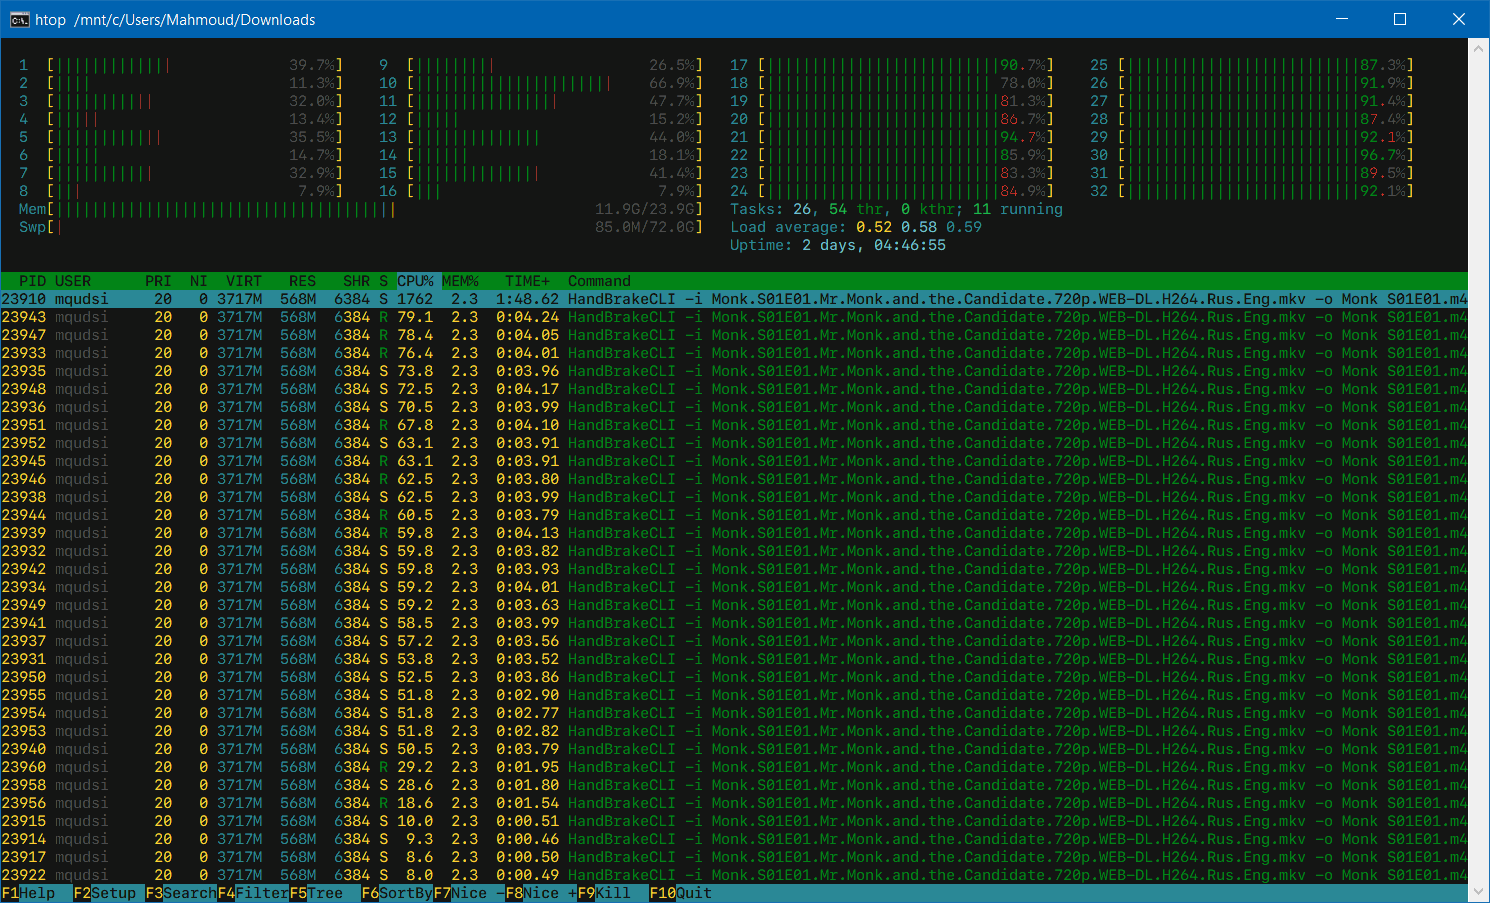 x264/x265 thread starvation on high core count CPUs (NUMA